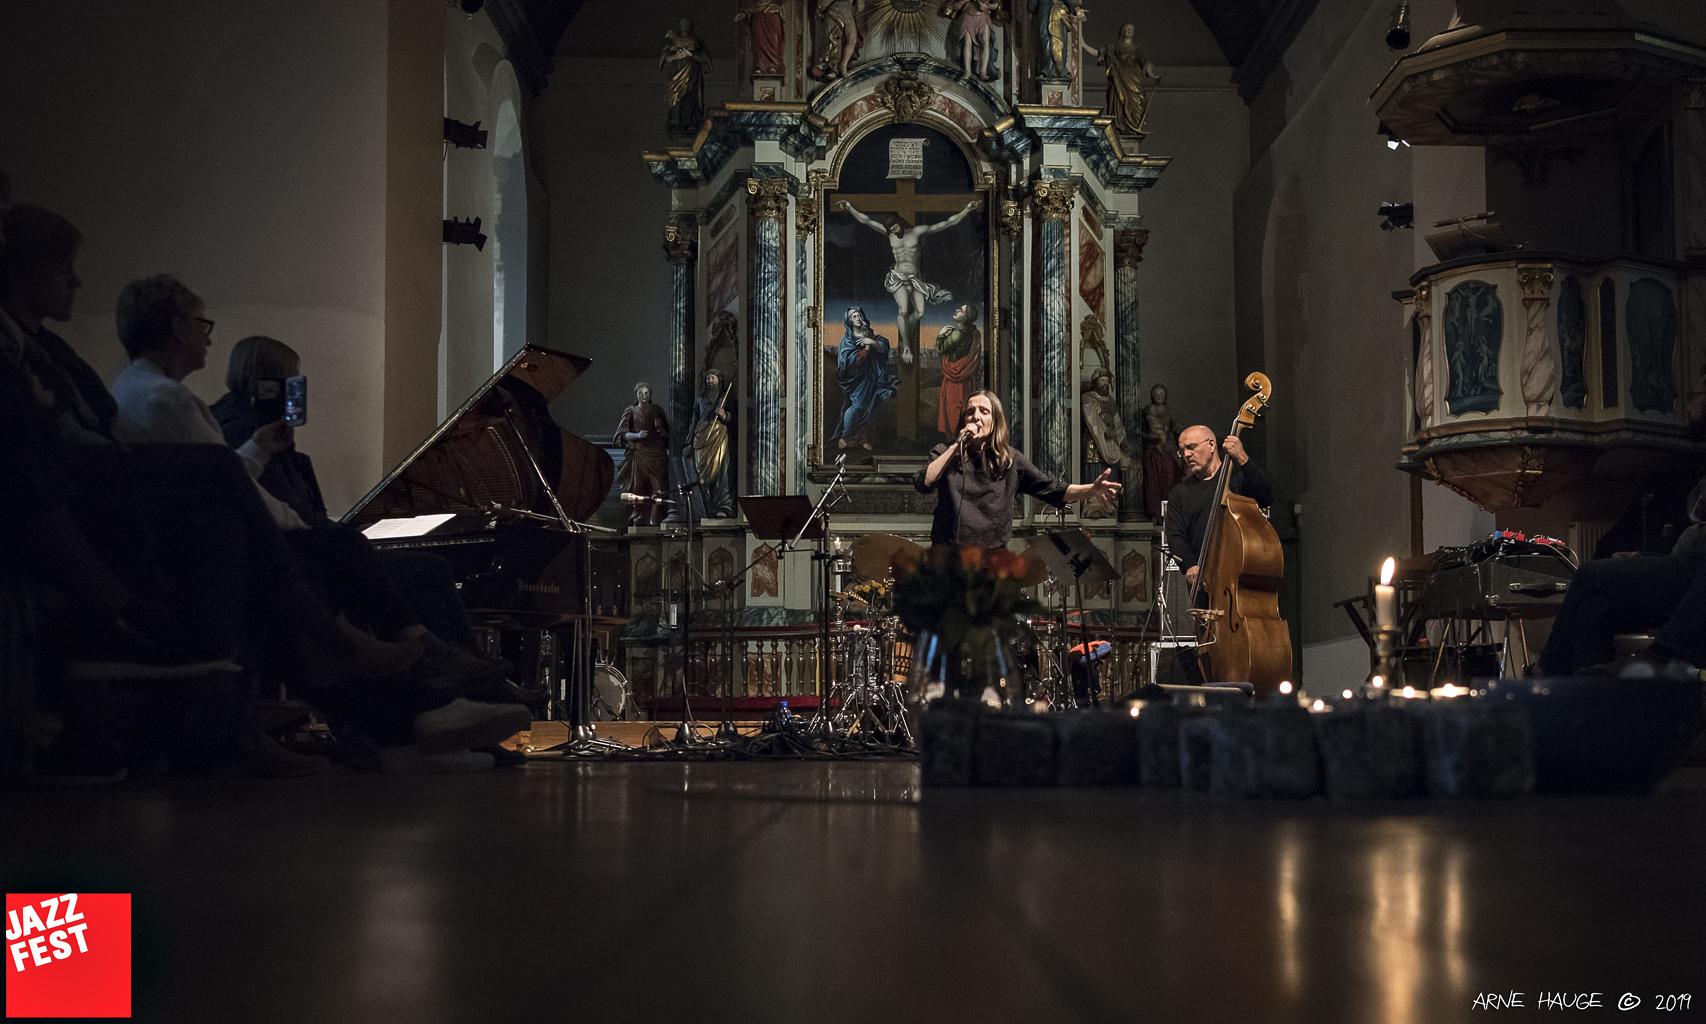 190510 Tamara Obrovac TransAdriatic Quartet @ Vår Frue Kirke - foto Arne Hauge_003.jpg